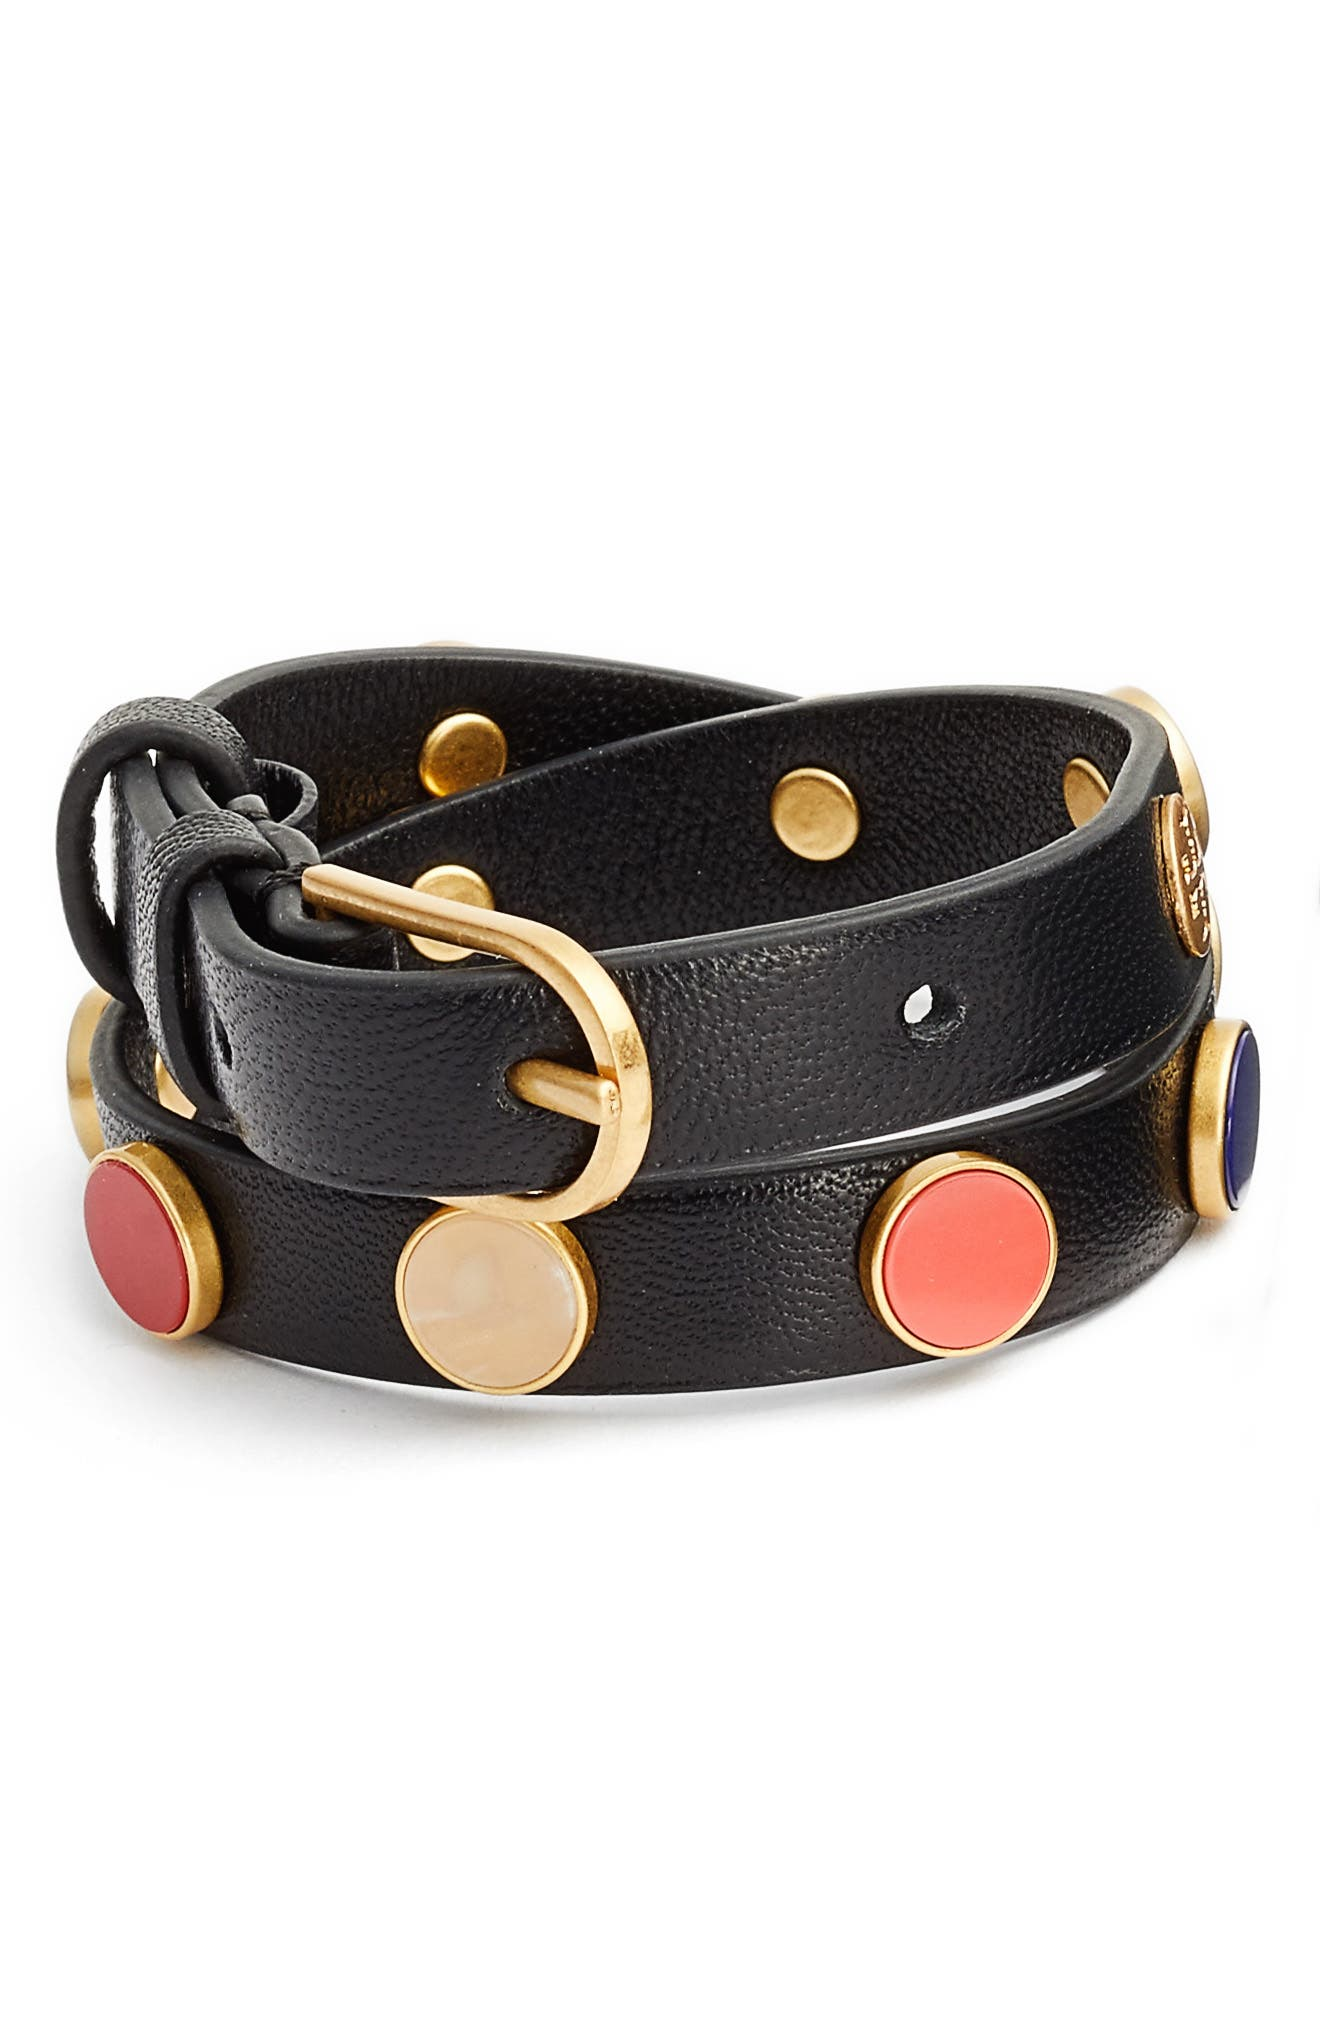 Leather Wrap Bracelet,                             Main thumbnail 1, color,                             Black/ Multi